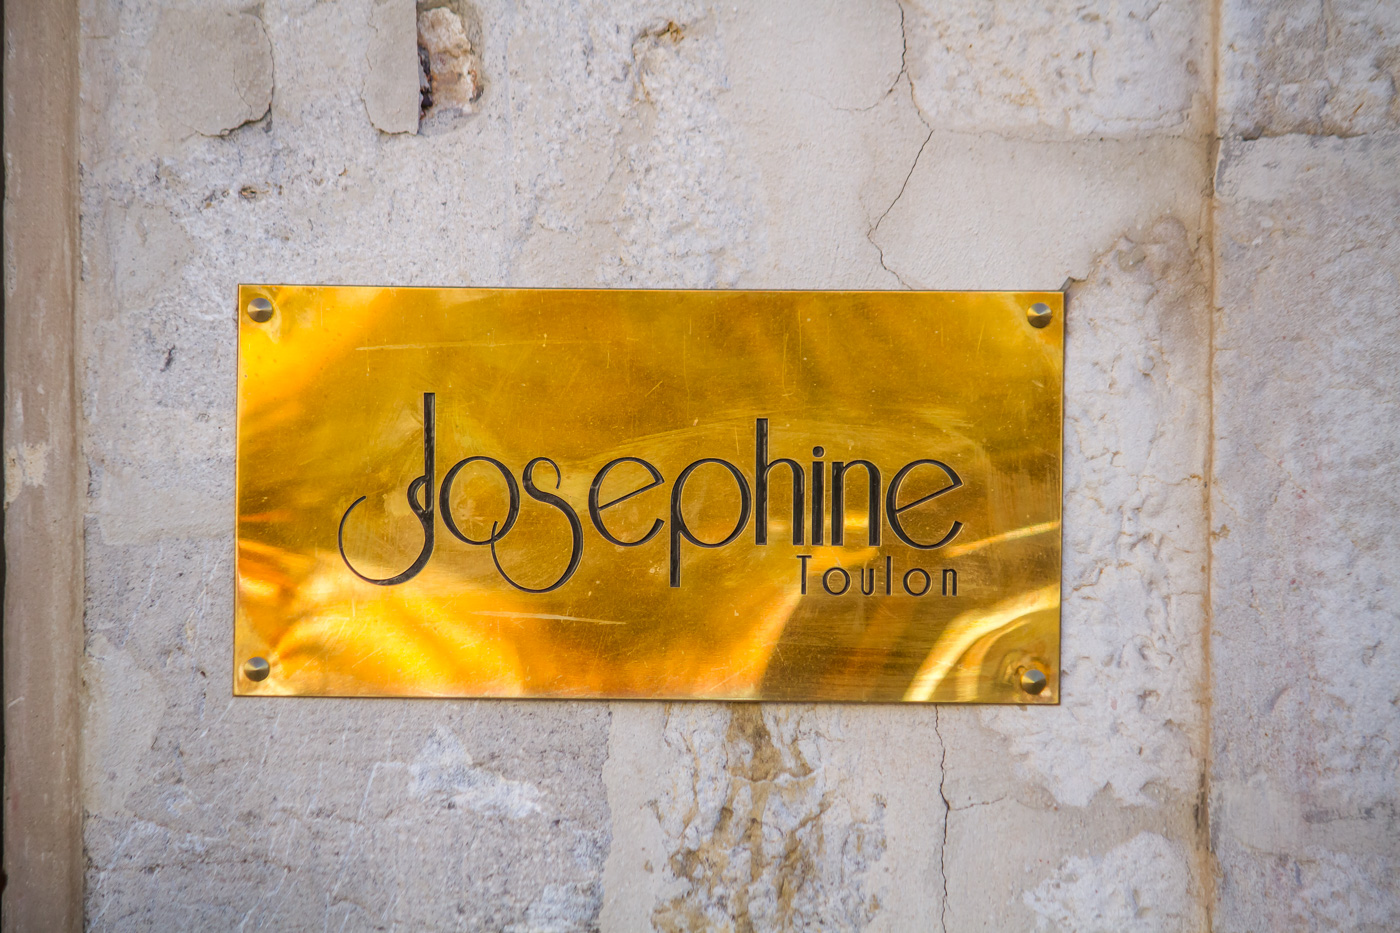 Restaurant Josephine Toulon